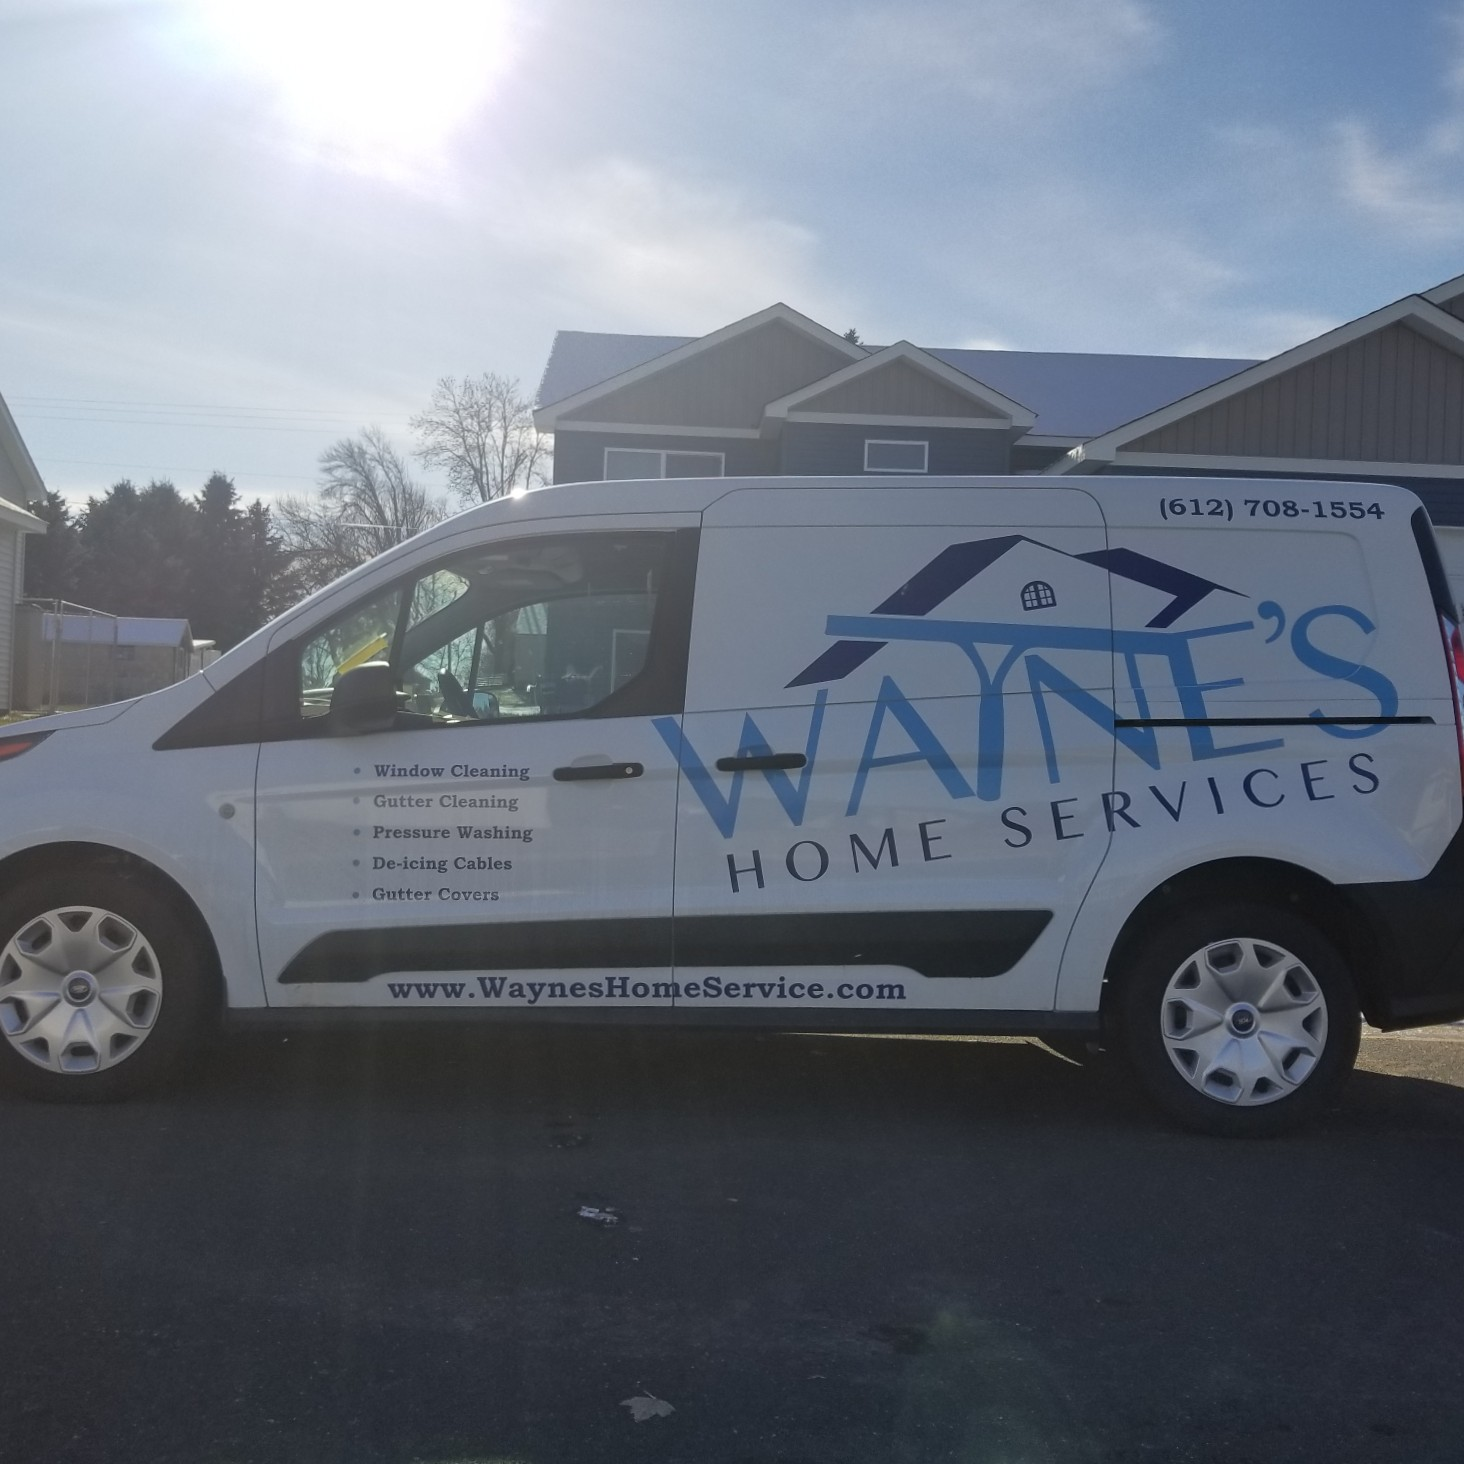 Wayne's Home Service